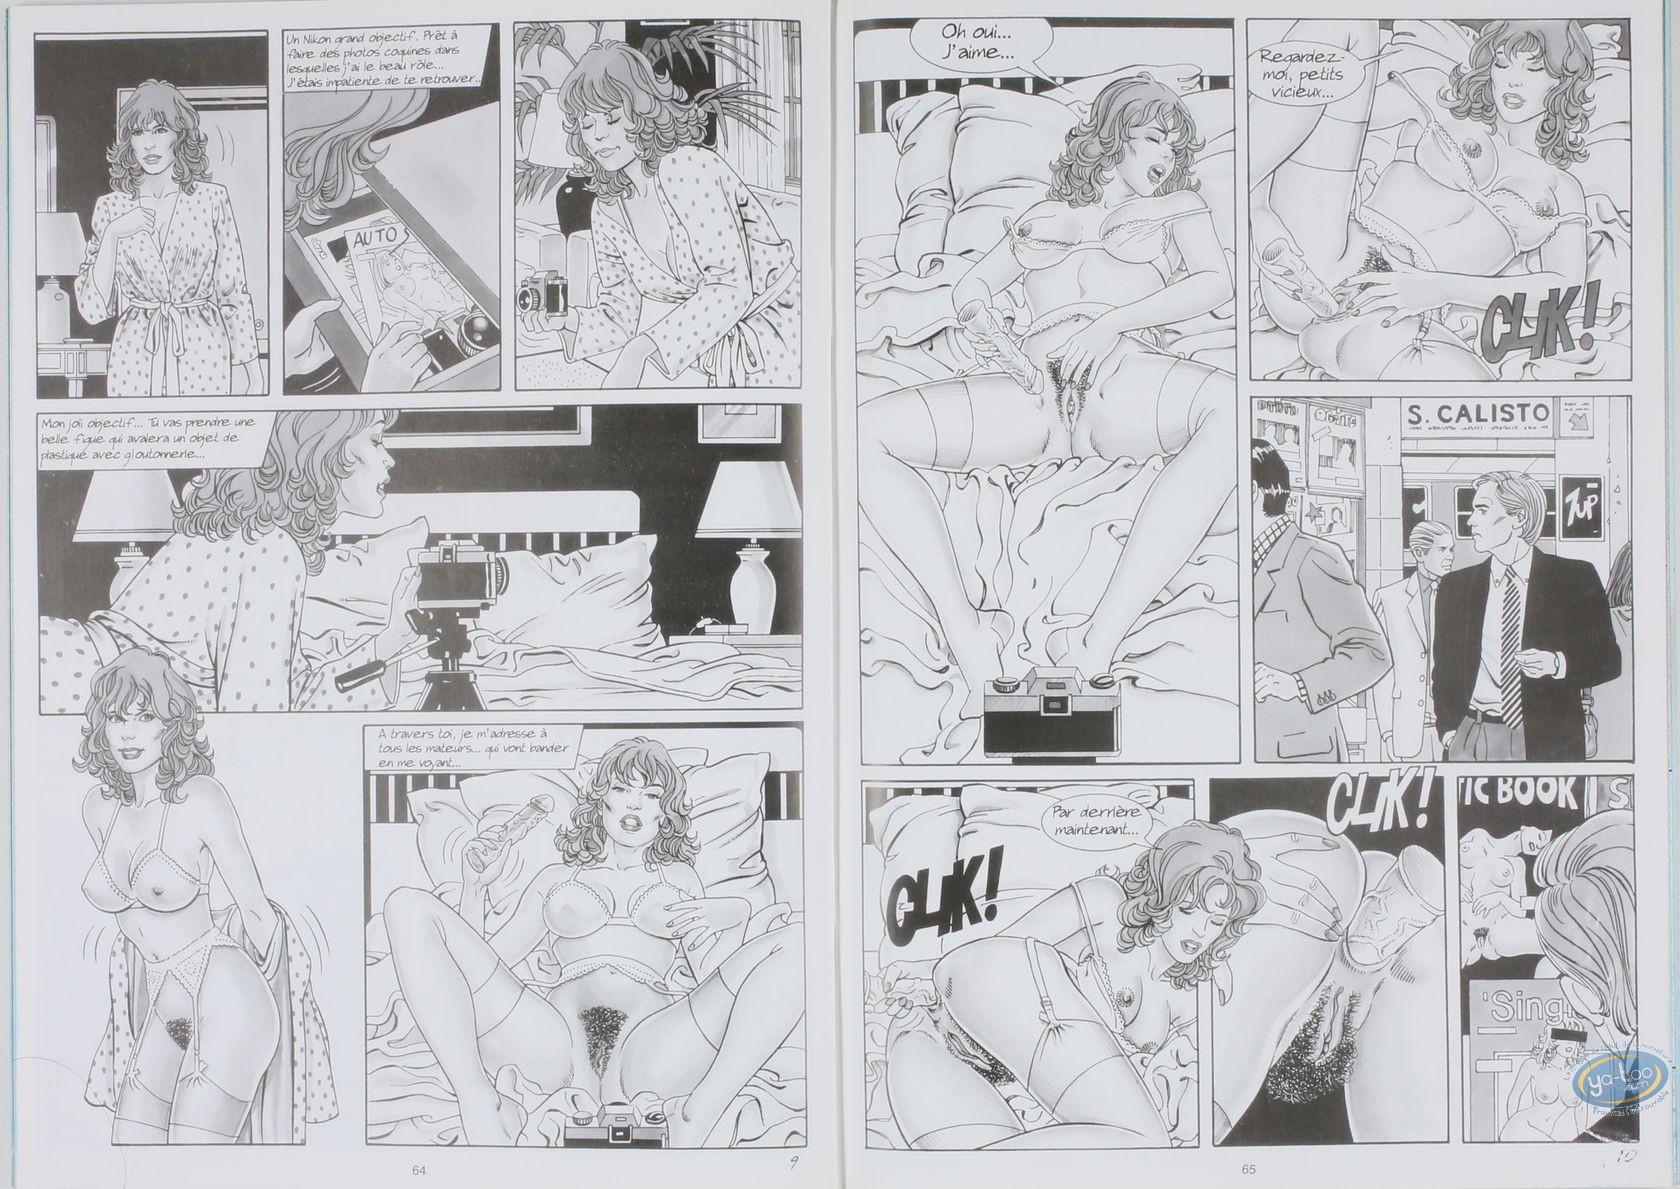 Set De Coloriage Asterix U.Buy Online Adult European Comic Books Bede Adult N 118 Recueil